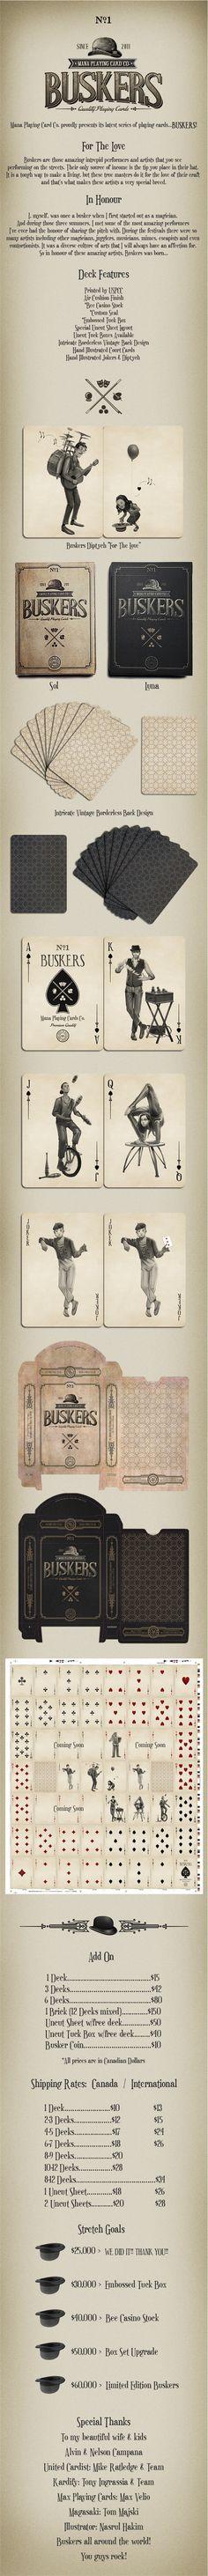 BUSKERS by Mana Playing Cards by Erik Mana & Alvin Campana — Kickstarter